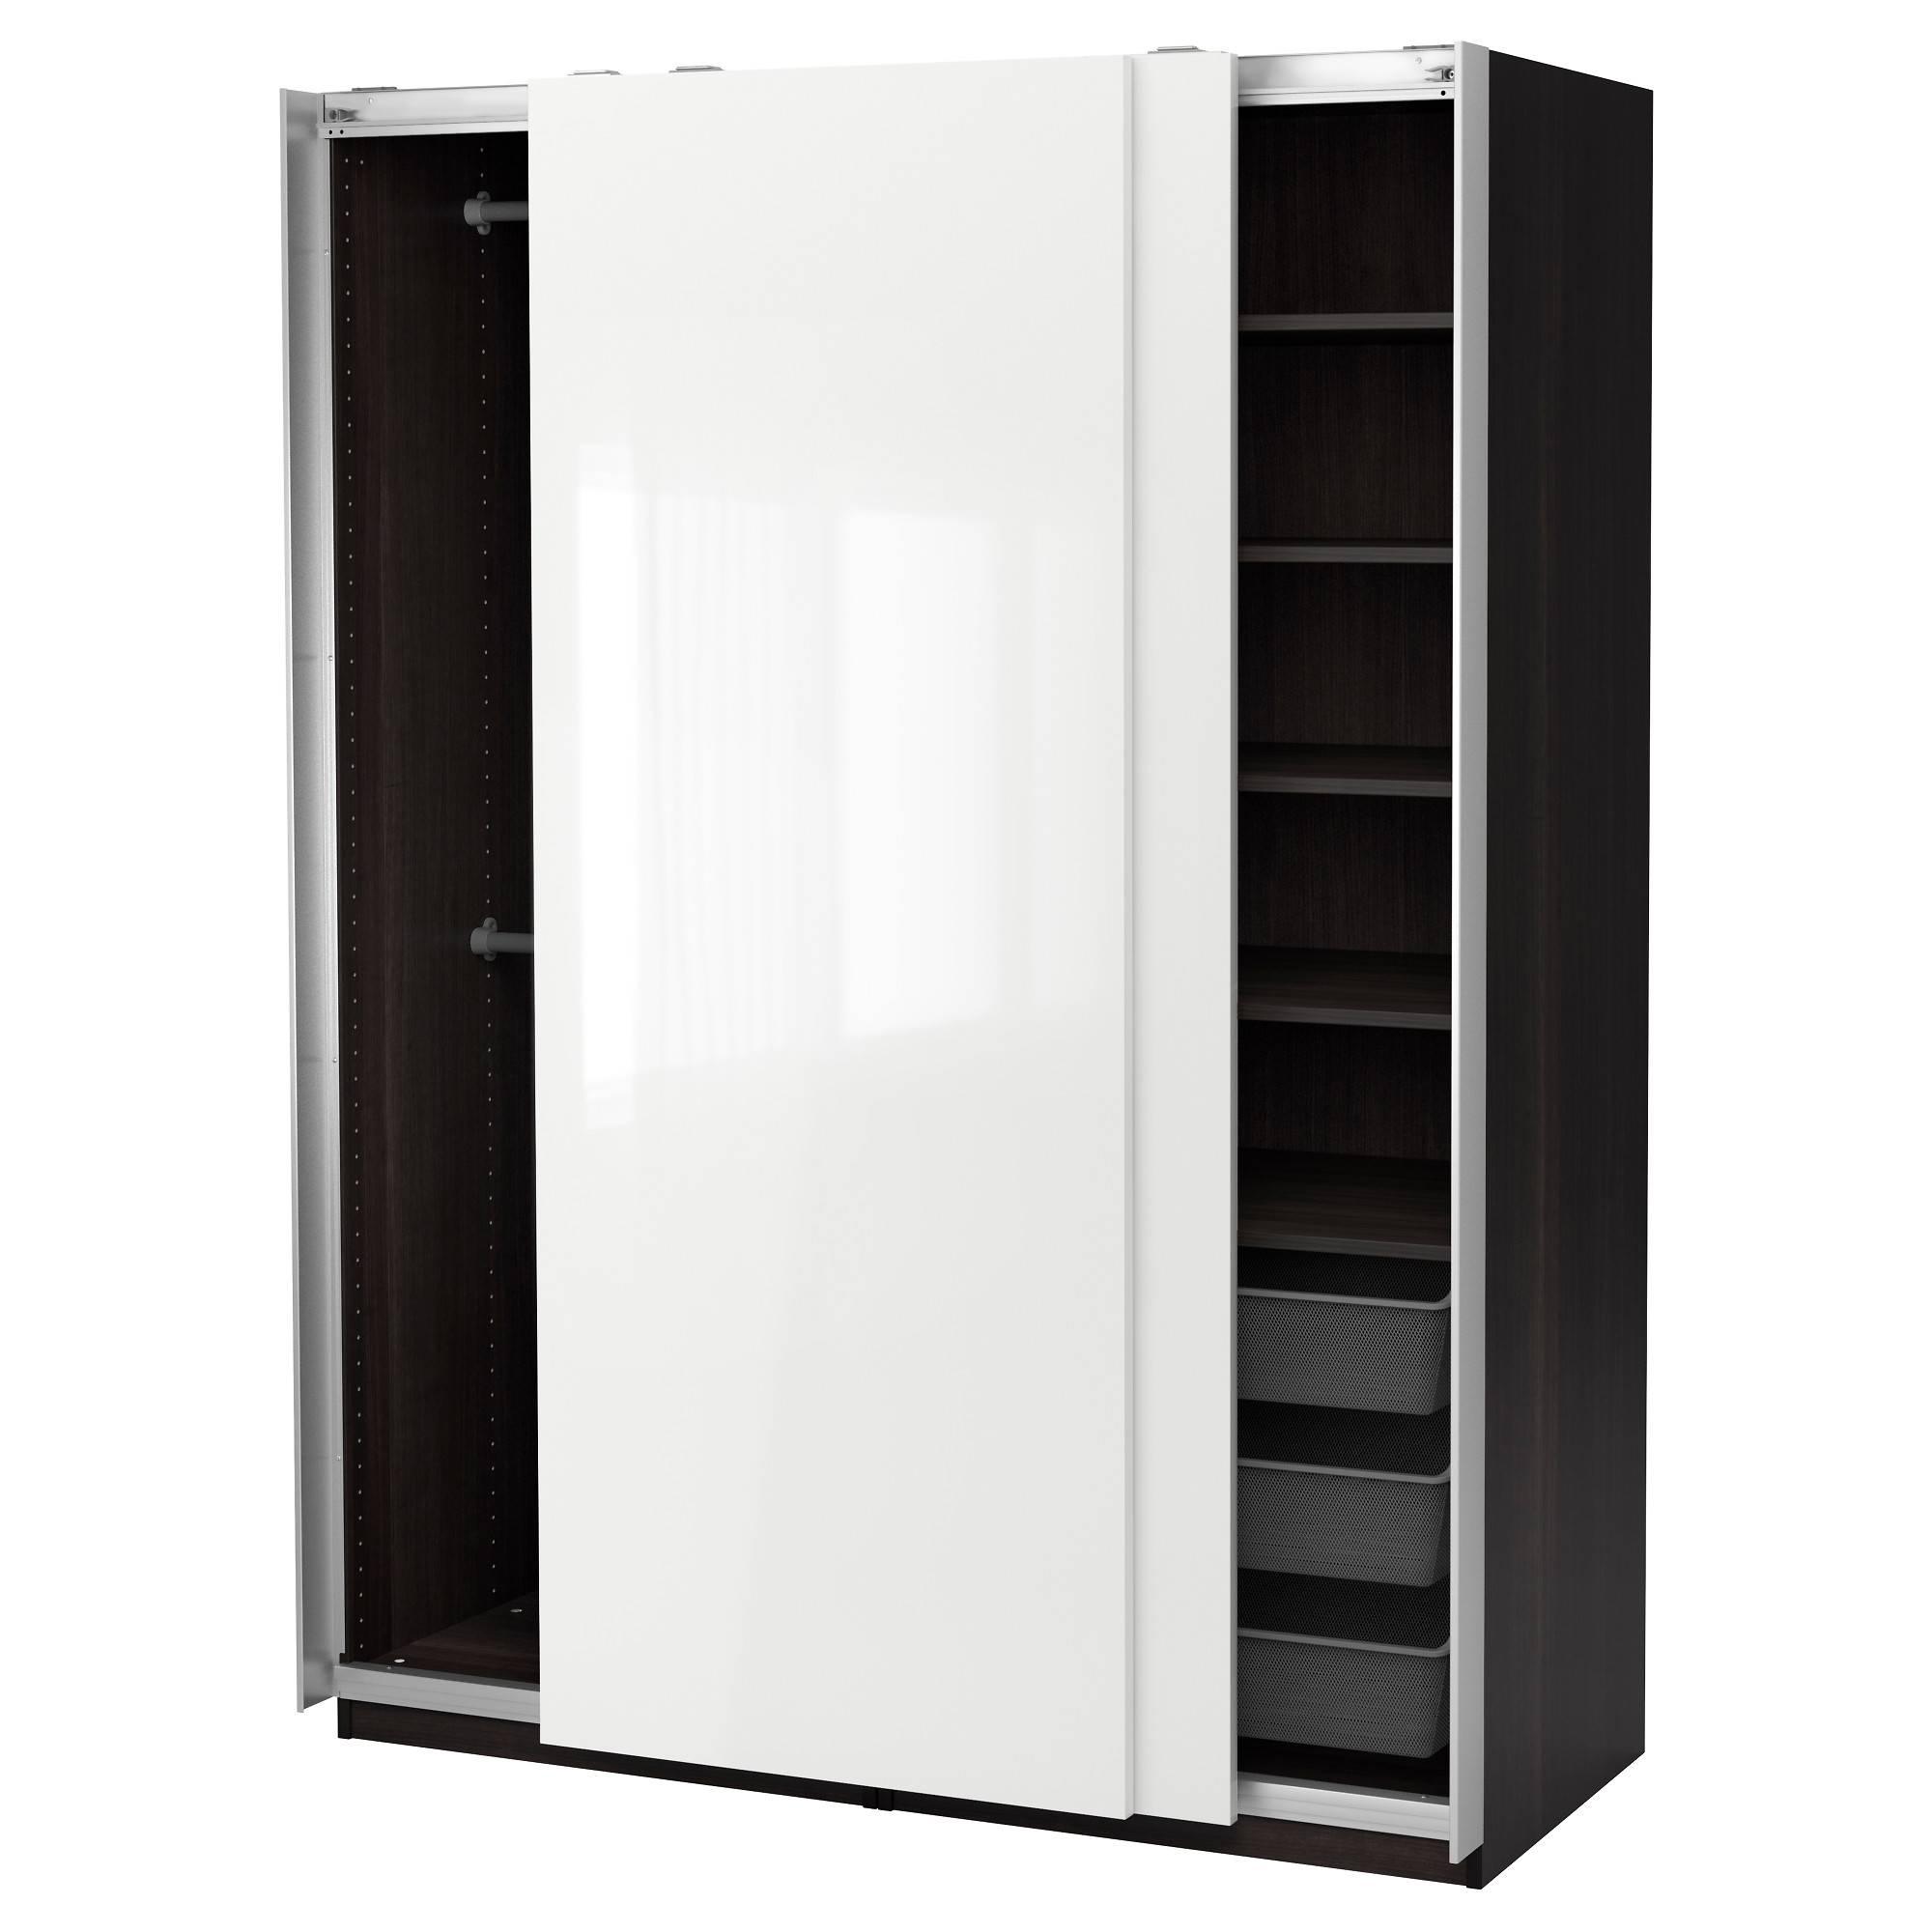 Pax Wardrobe Black-Brown/hasvik High-Gloss/white 150X66X201 Cm - Ikea pertaining to Black High Gloss Wardrobes (Image 13 of 15)